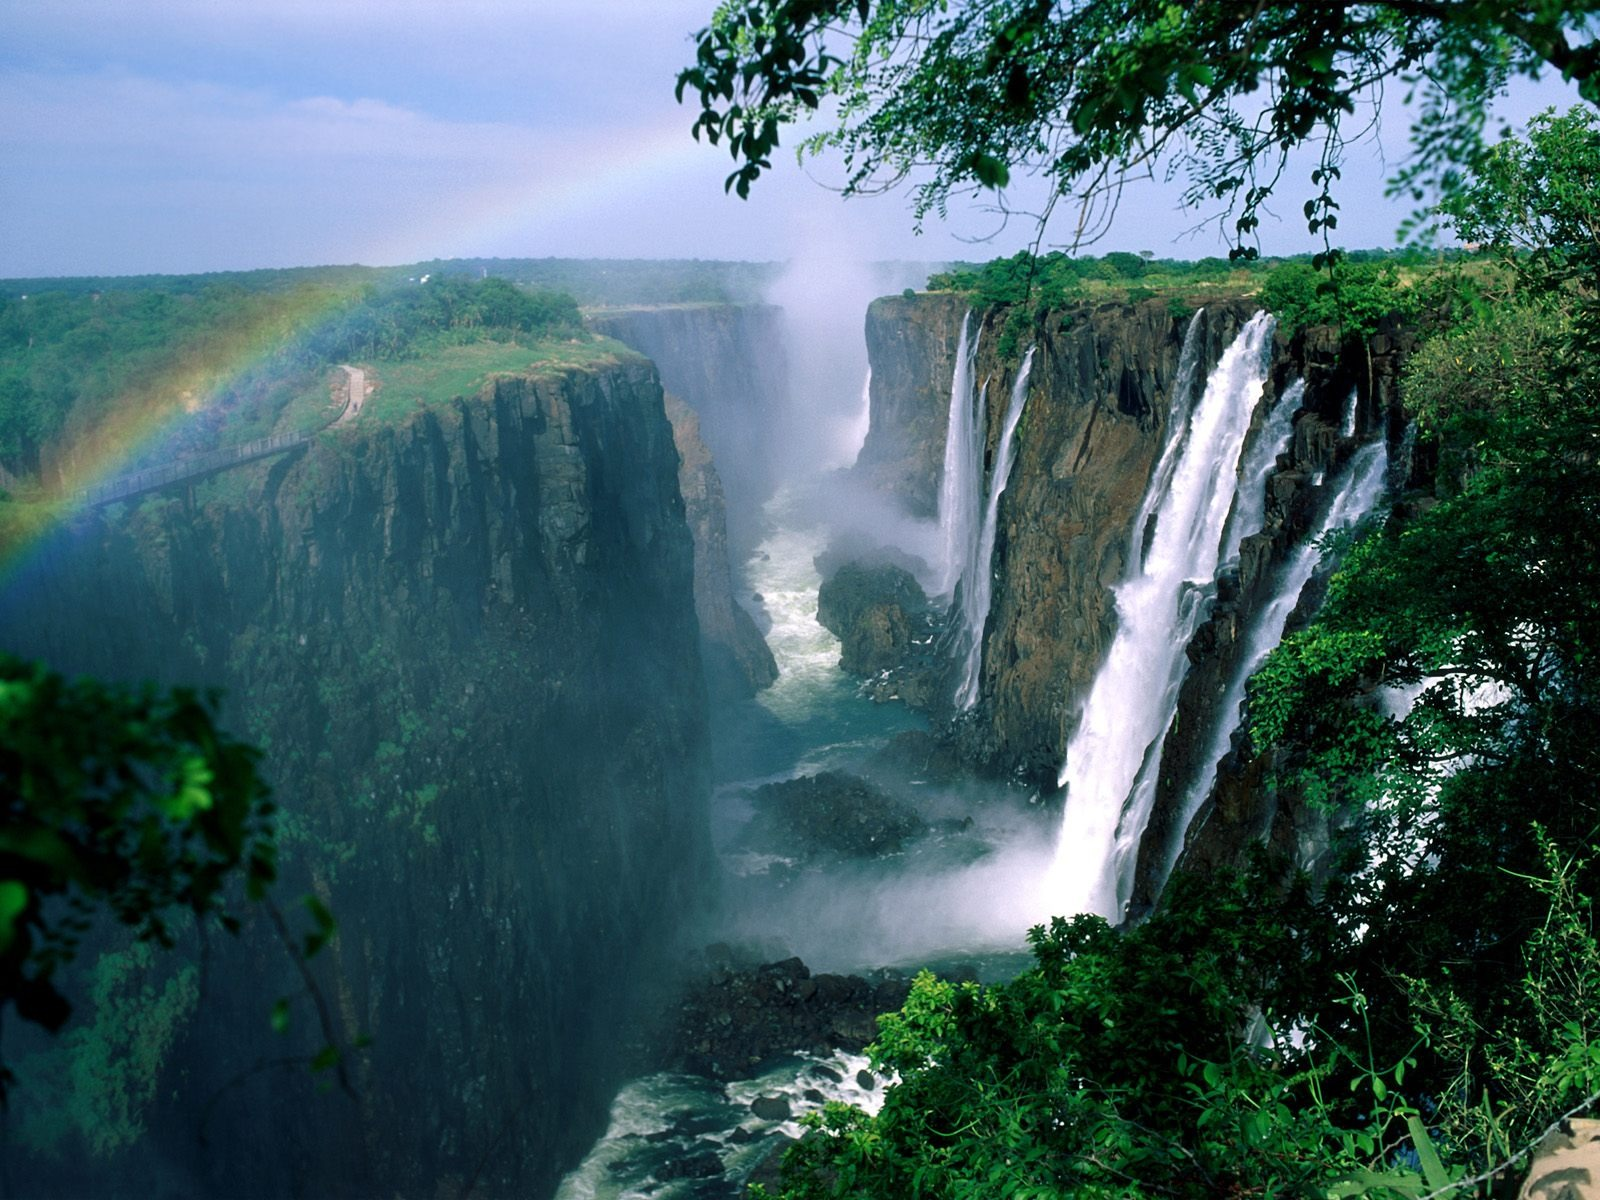 Victoria Falls Wallpaper Waterfalls Nature Wallpapers In Jpg Format